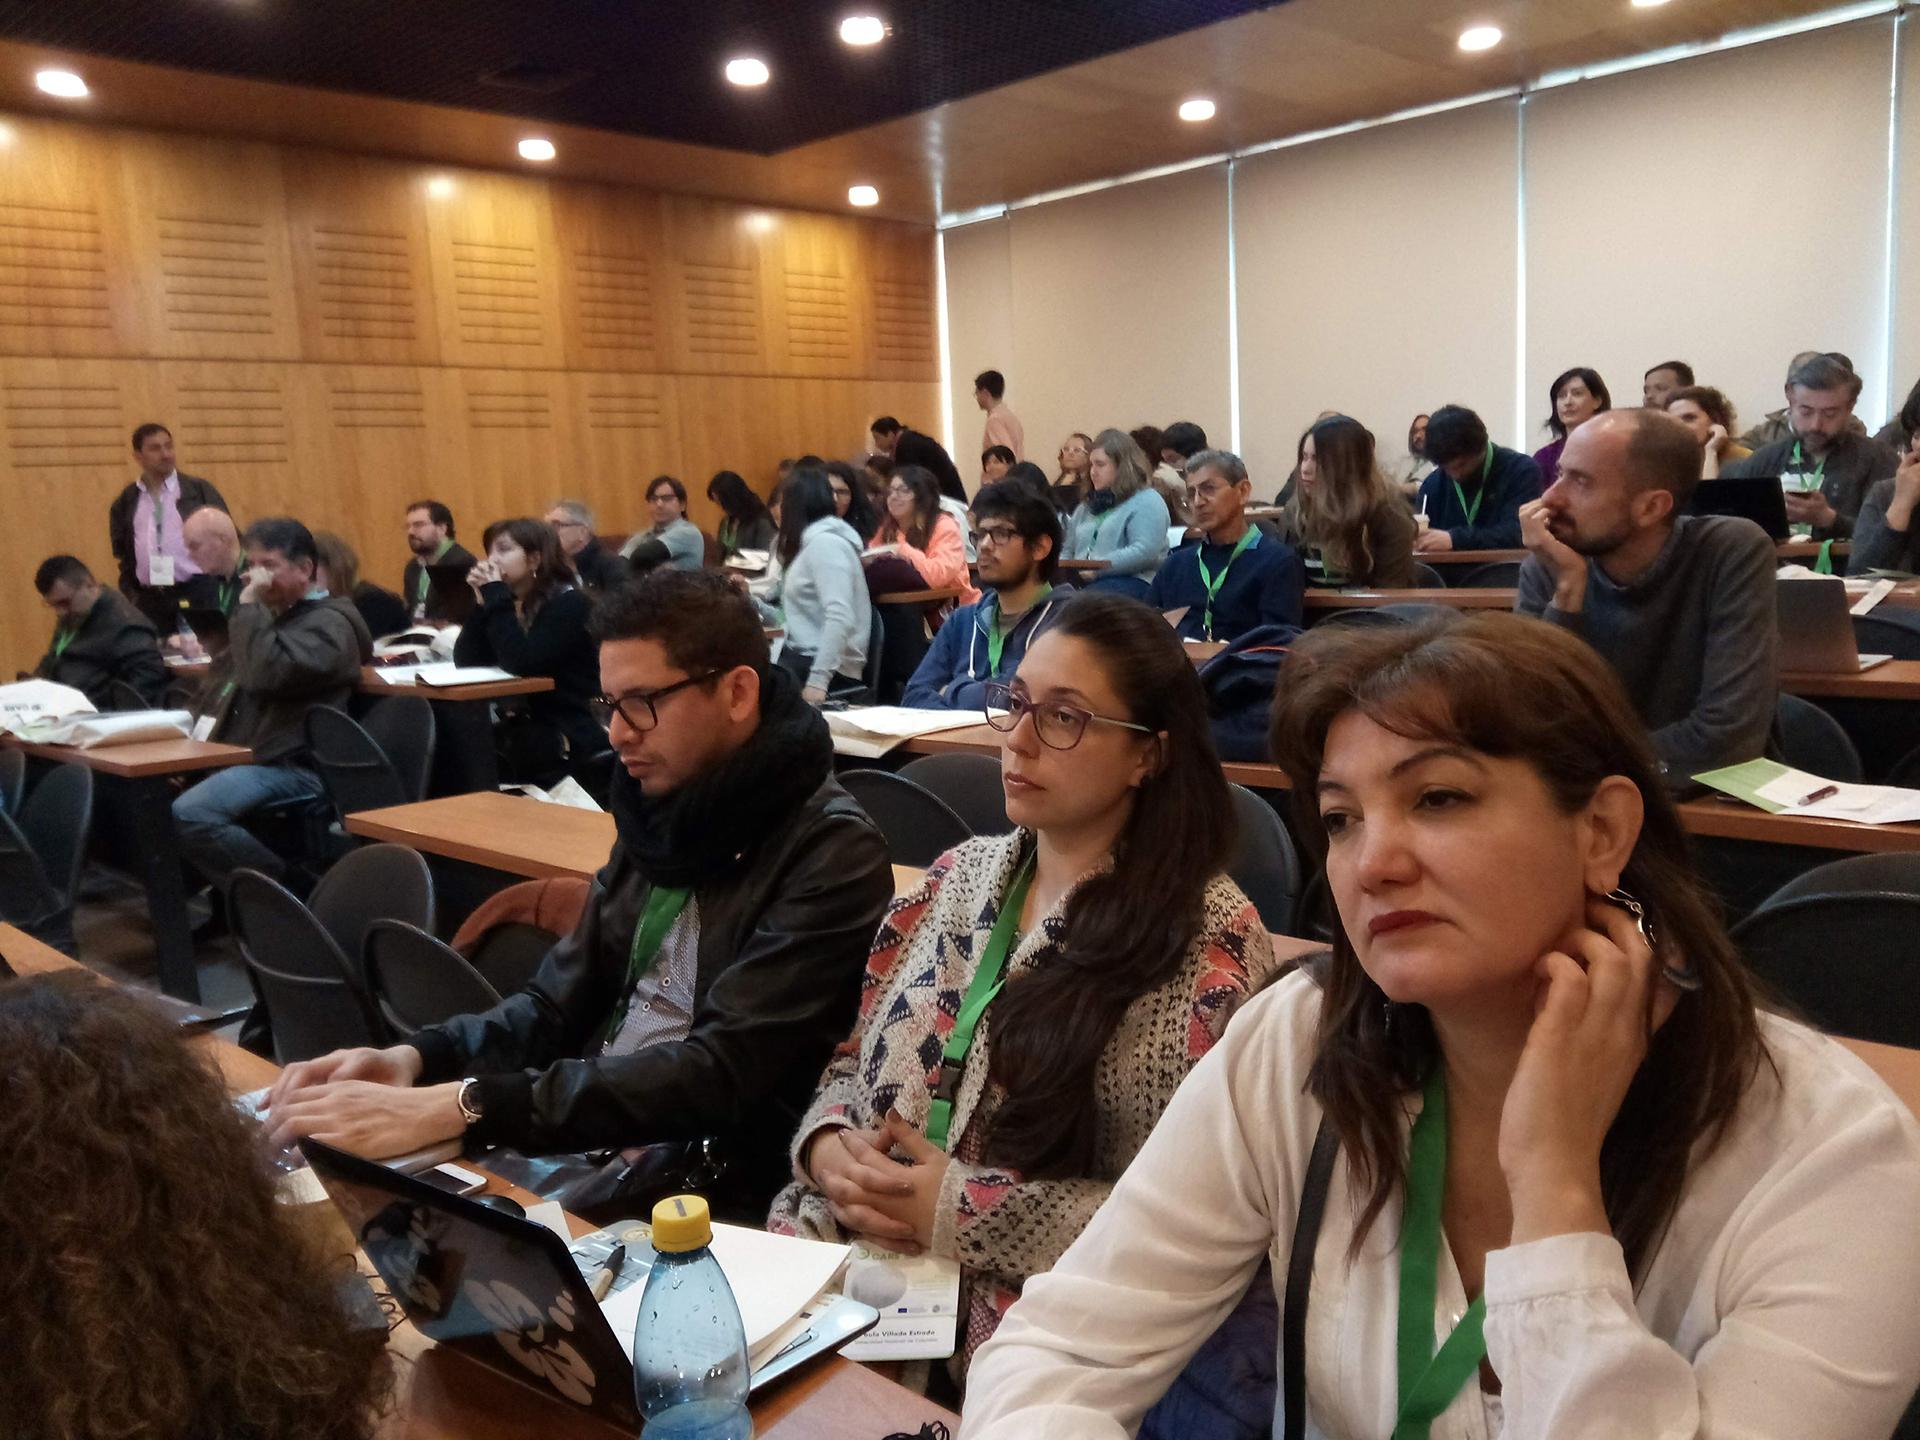 La sala conferenze